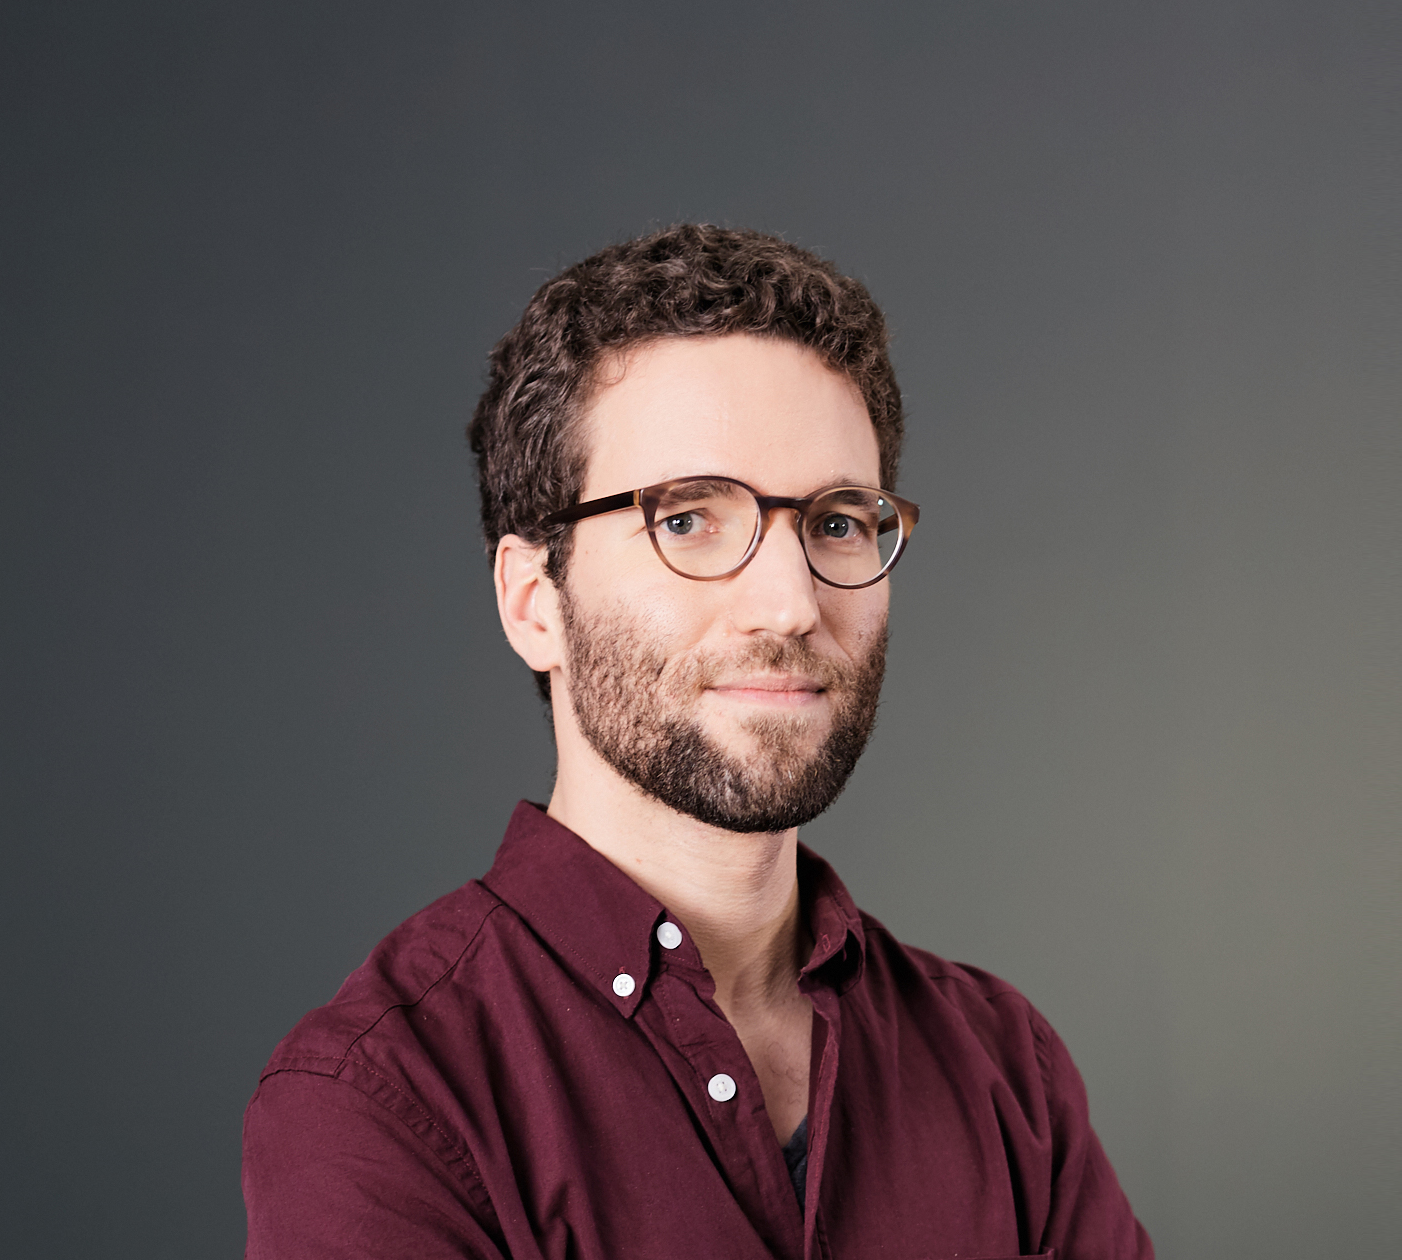 SEO-Experte Portrait